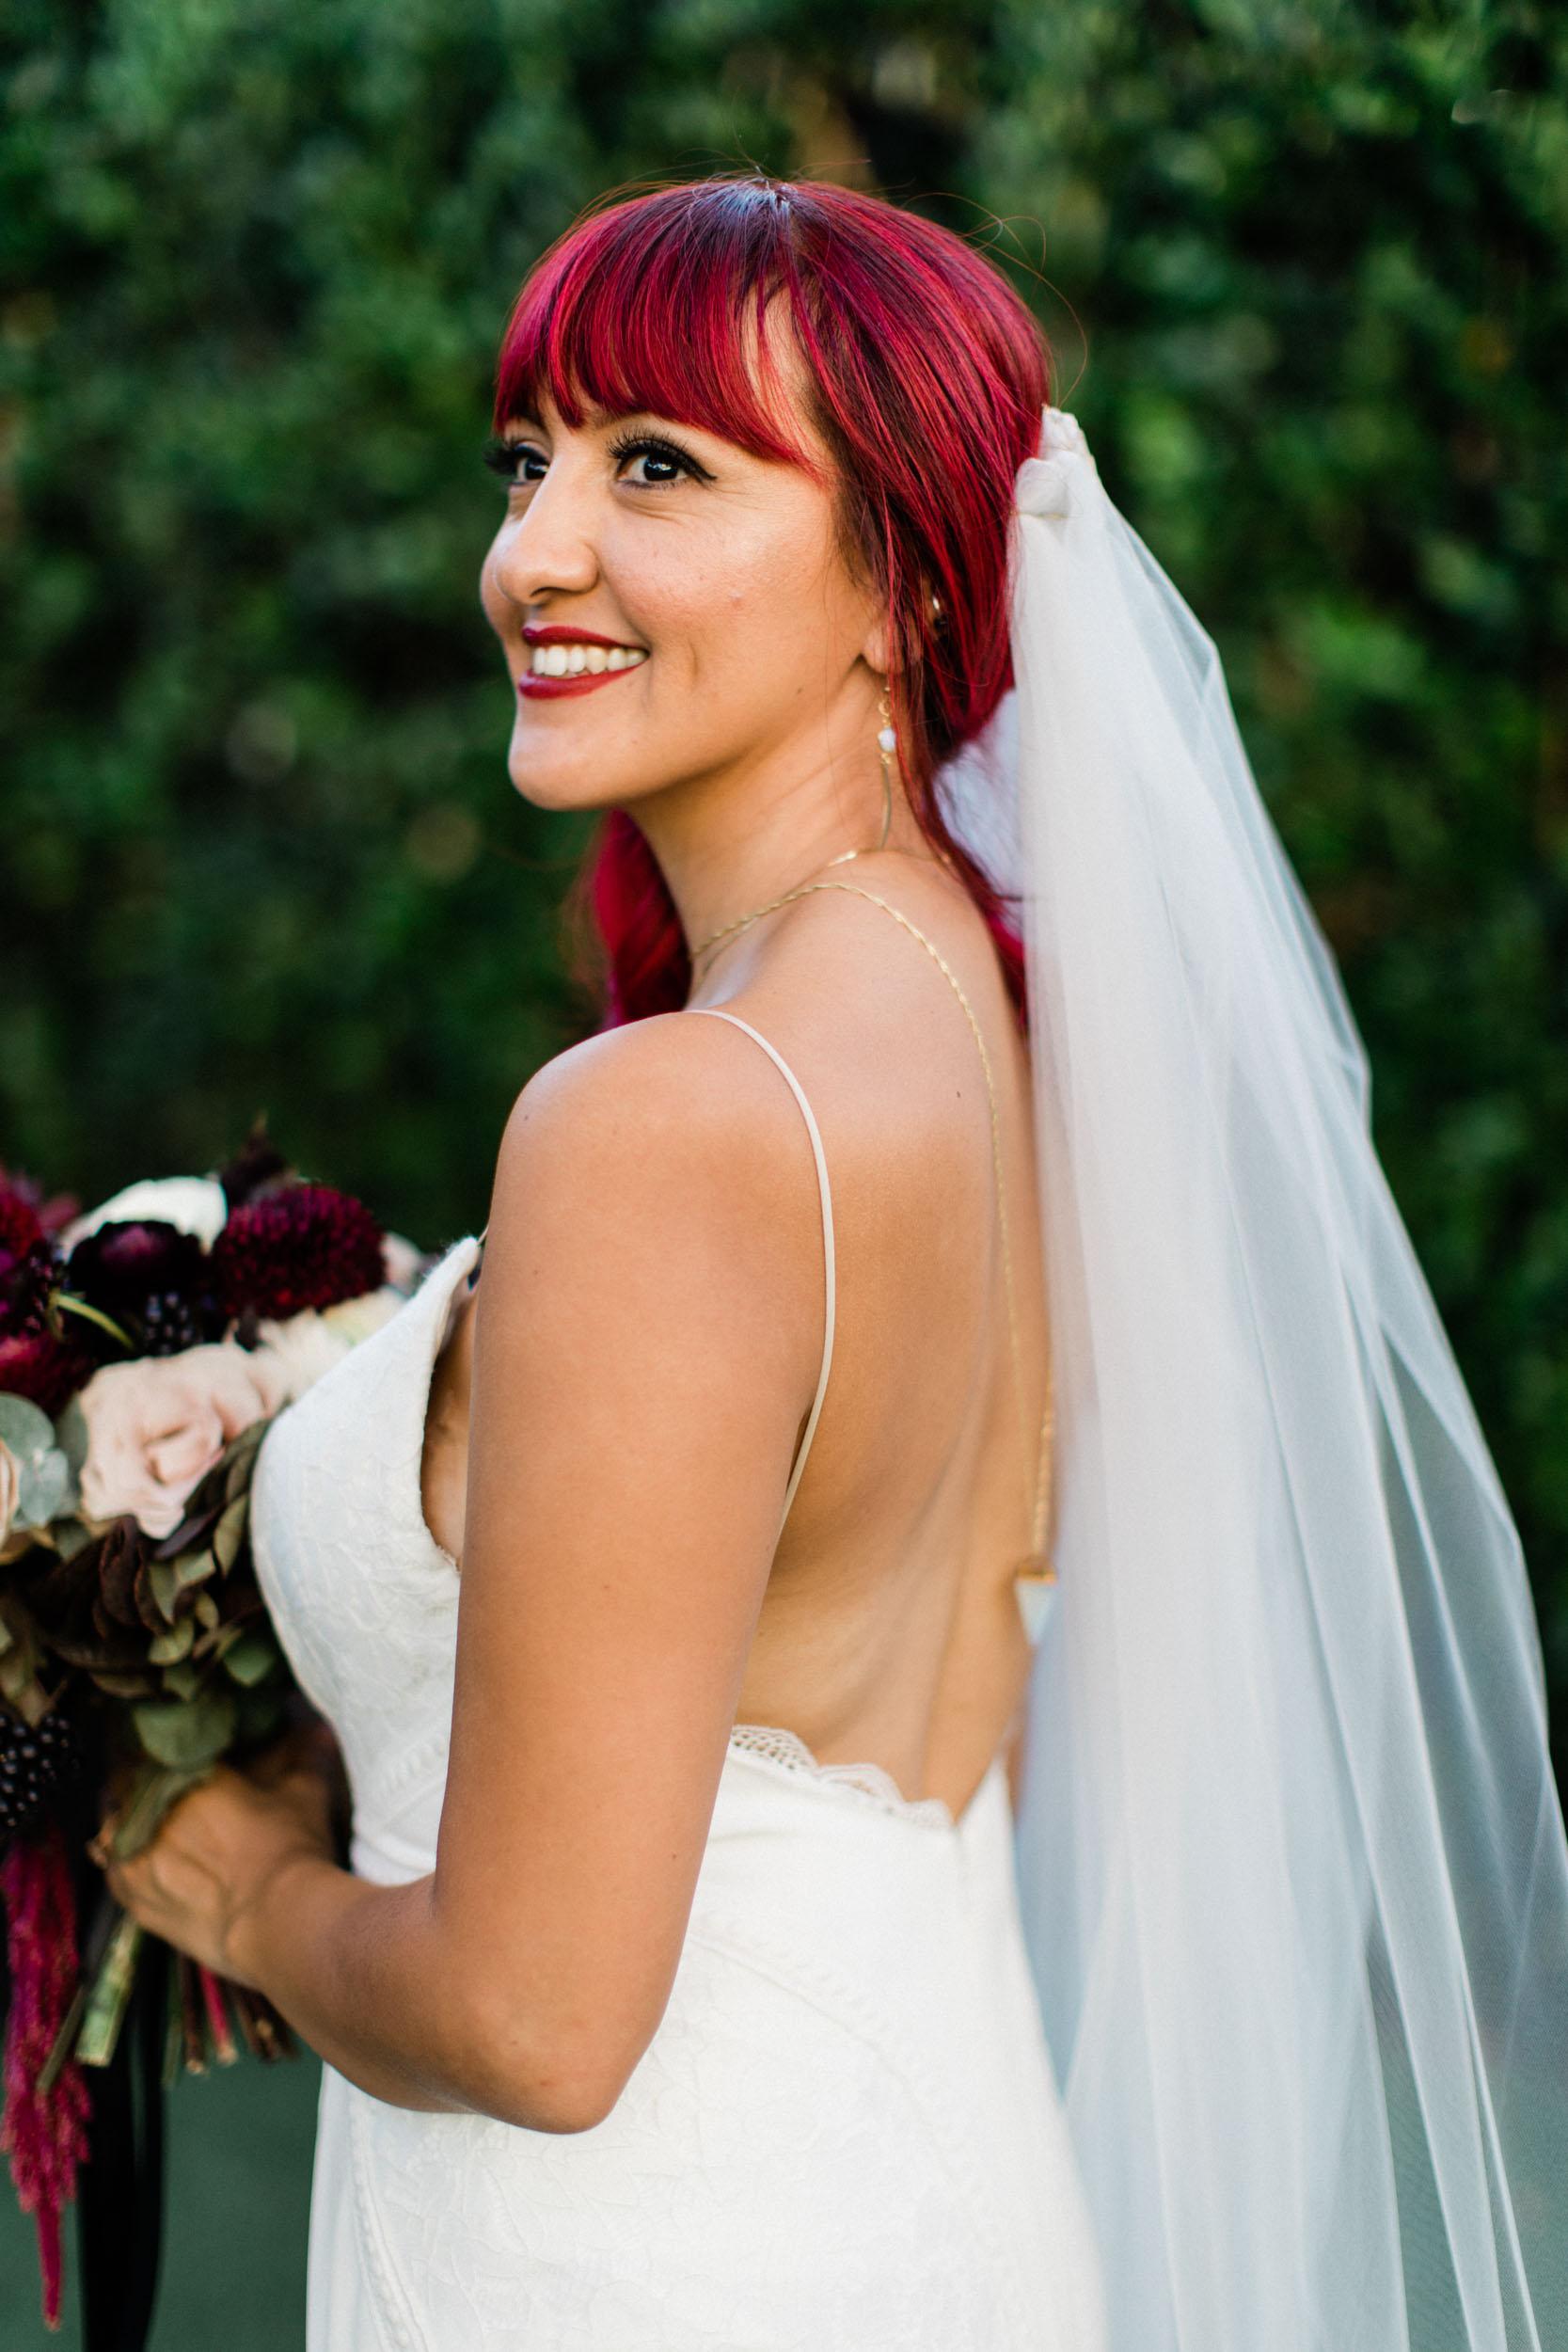 BKM-Photography-Los-Angeles-Highland-Park-York-Manor-Wedding-Photography-0838.jpg